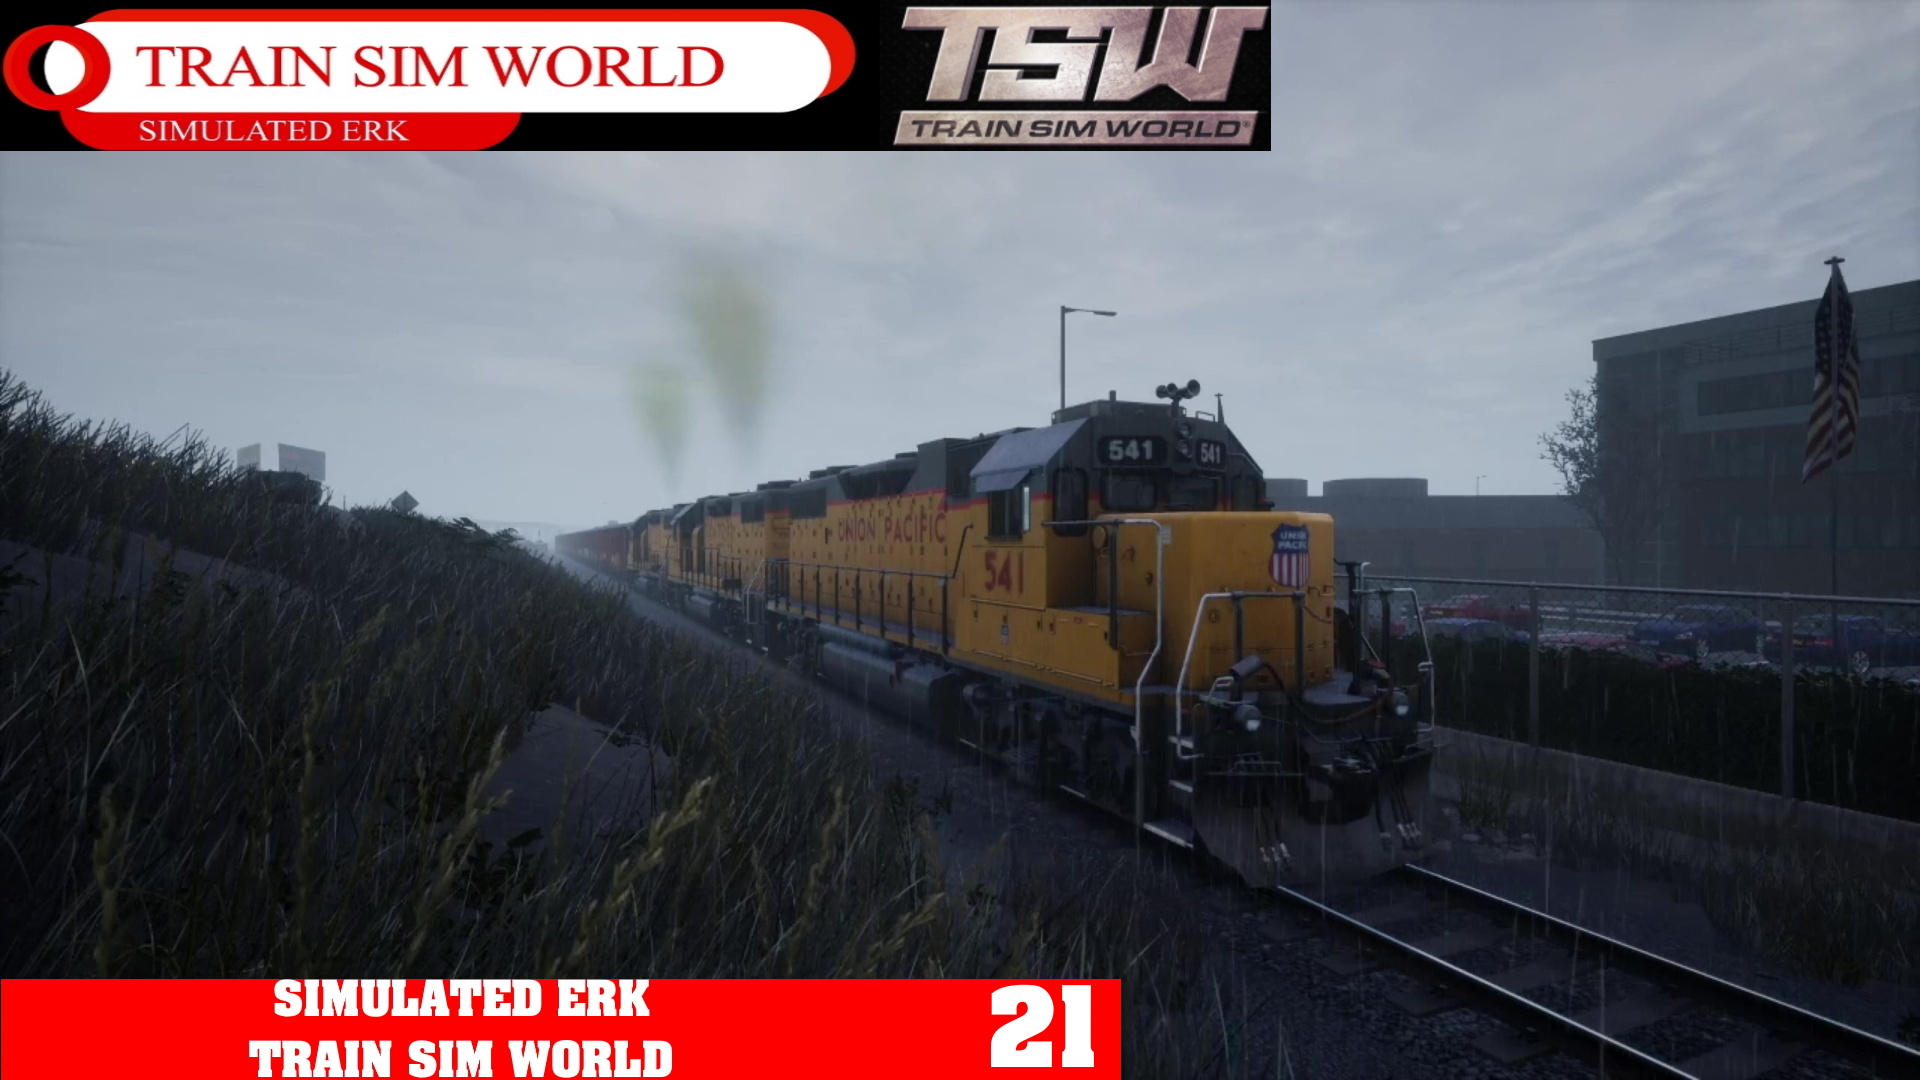 Simulated Erk: Train Sim World episode 21 | San Fran Freighter